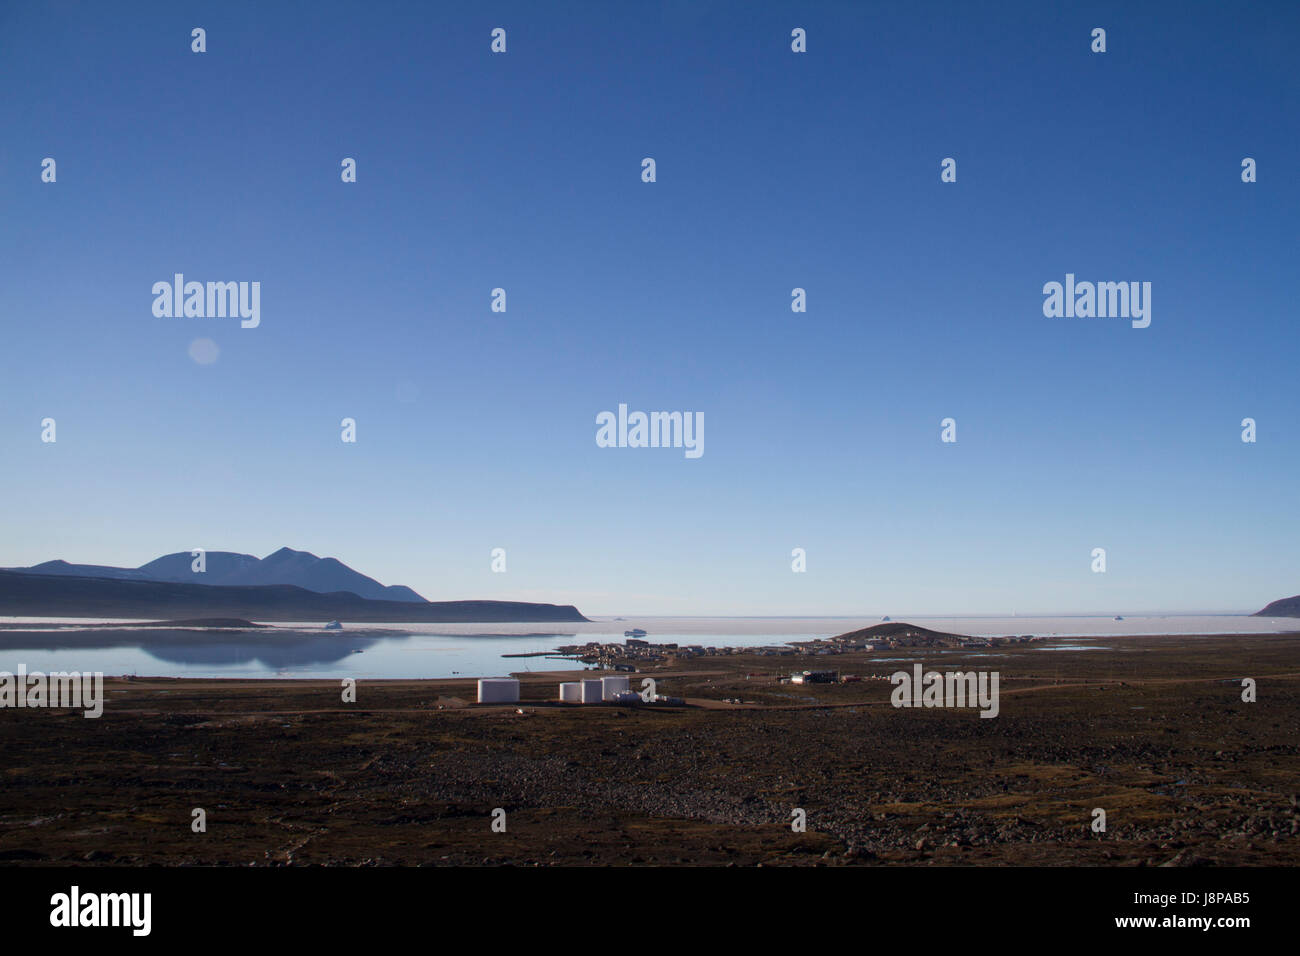 Evening view of Qikiqtarjauq, Broughton Island, Nunavut Canada - Stock Image